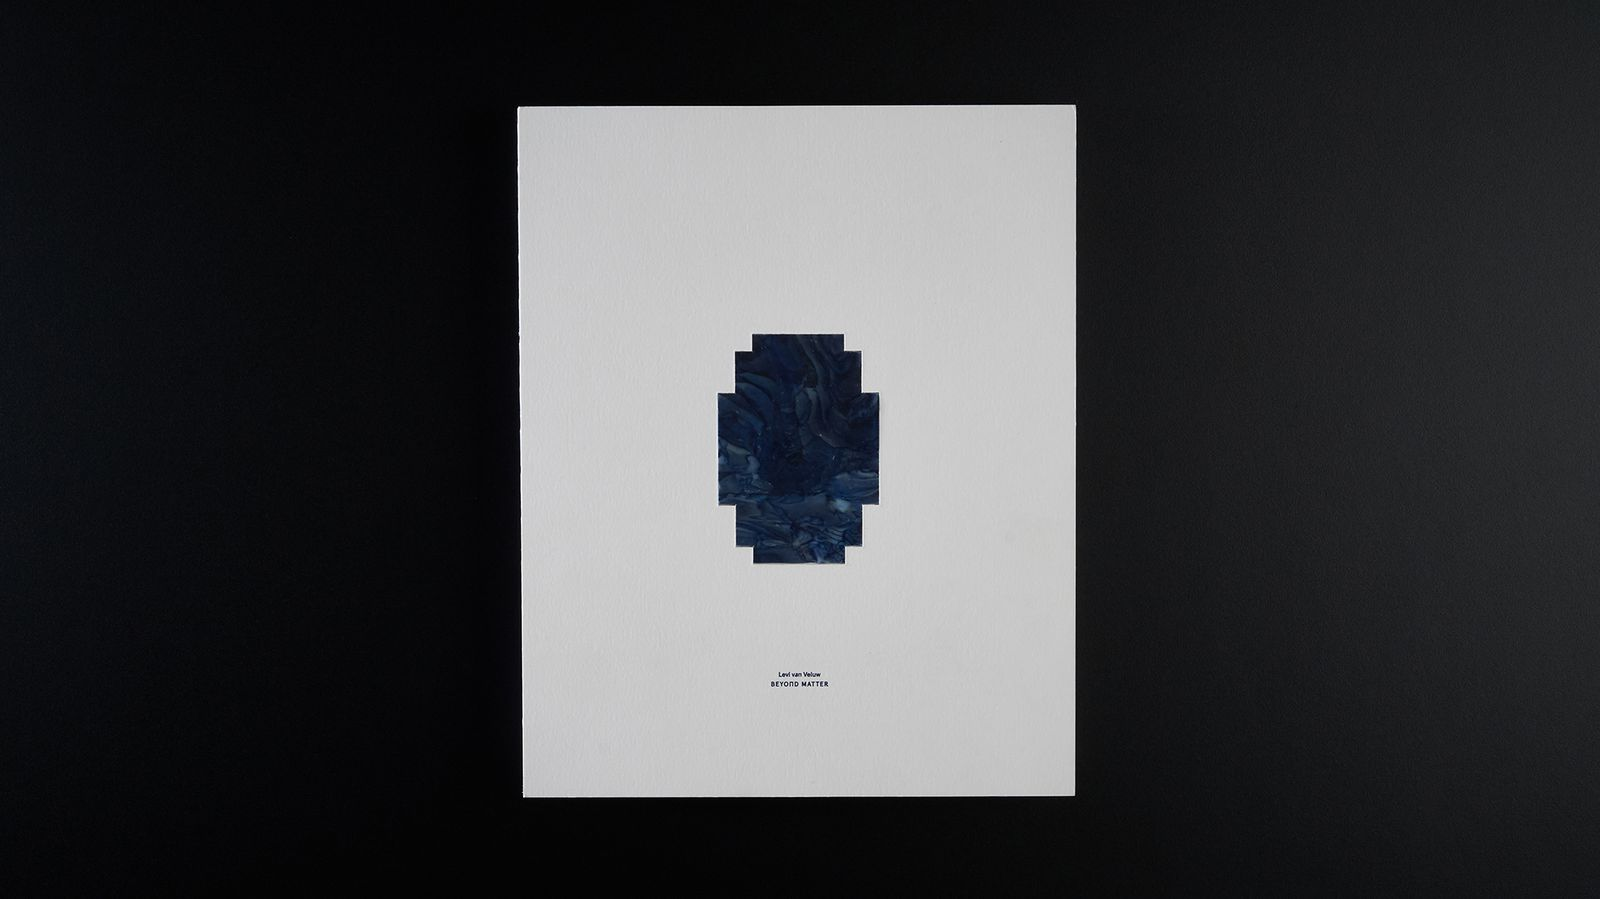 Beyond matter - Cover.jpg